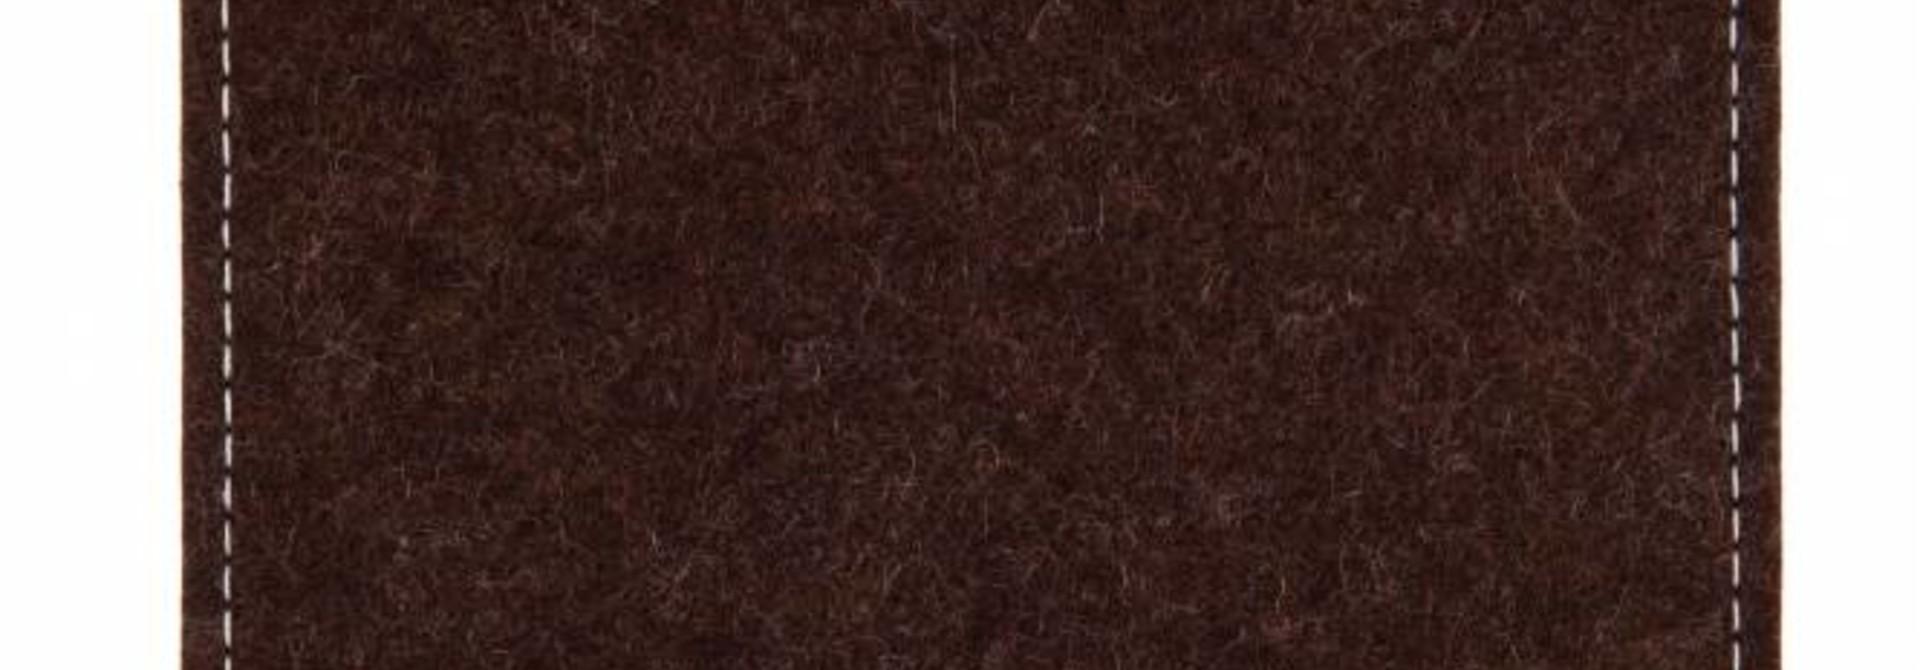 Intuos Sleeve Truffle-Brown